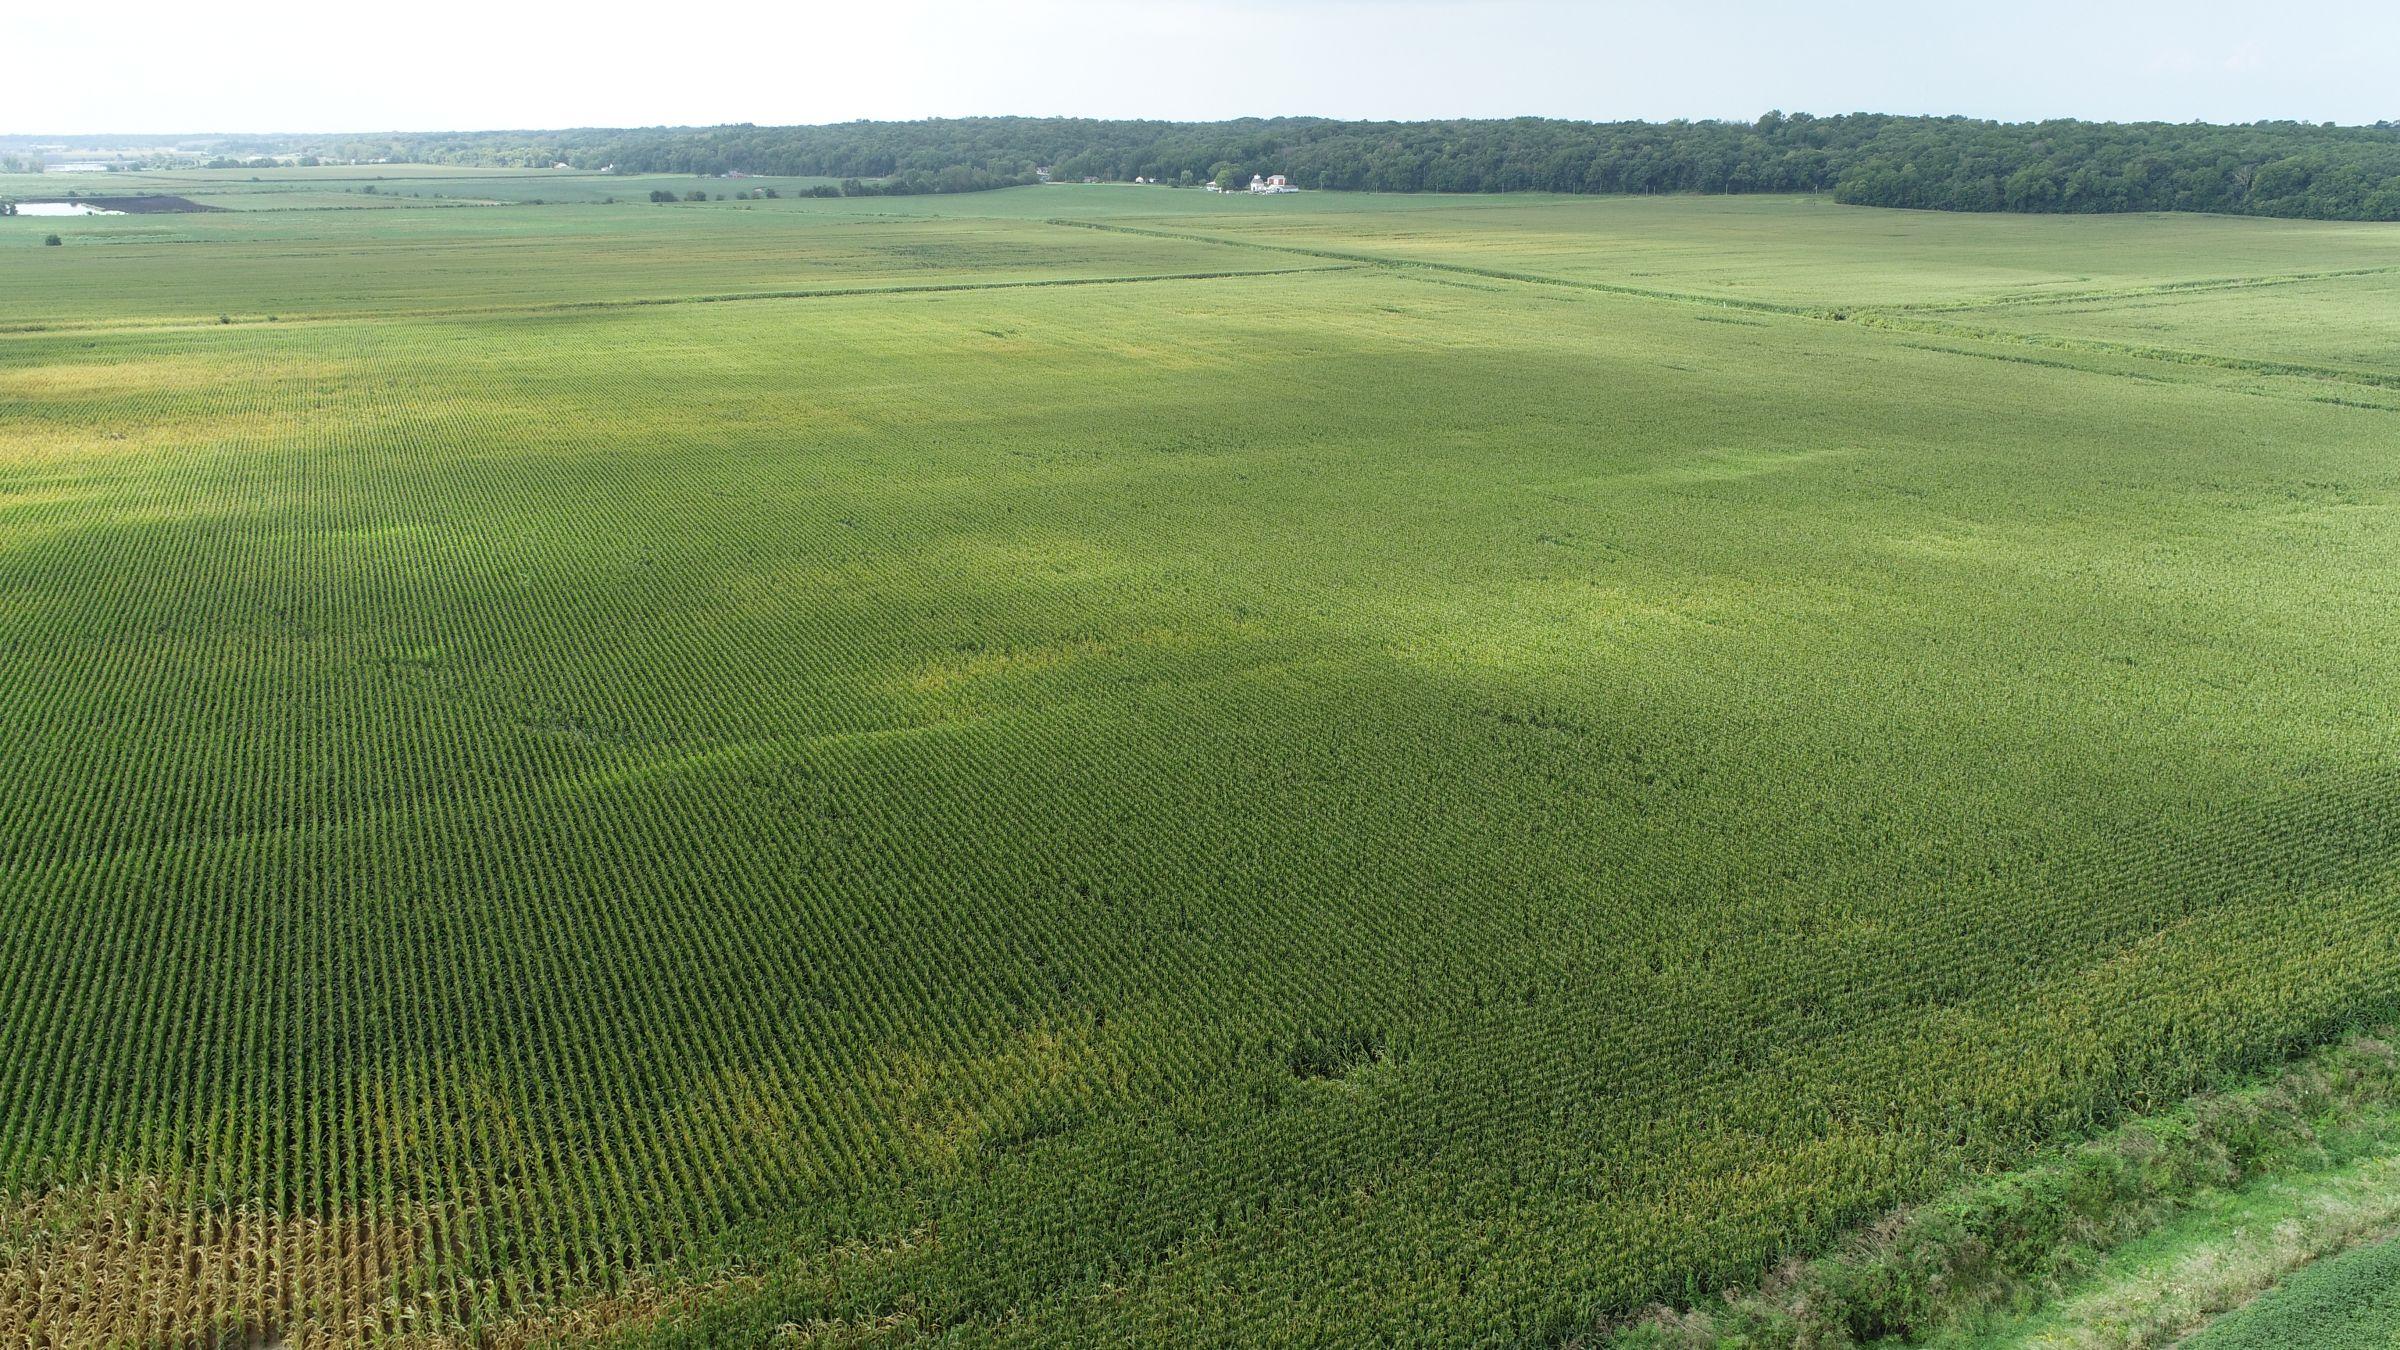 land-whiteside-county-illinois-146-acres-listing-number-15705-1-2021-08-27-180458.JPG